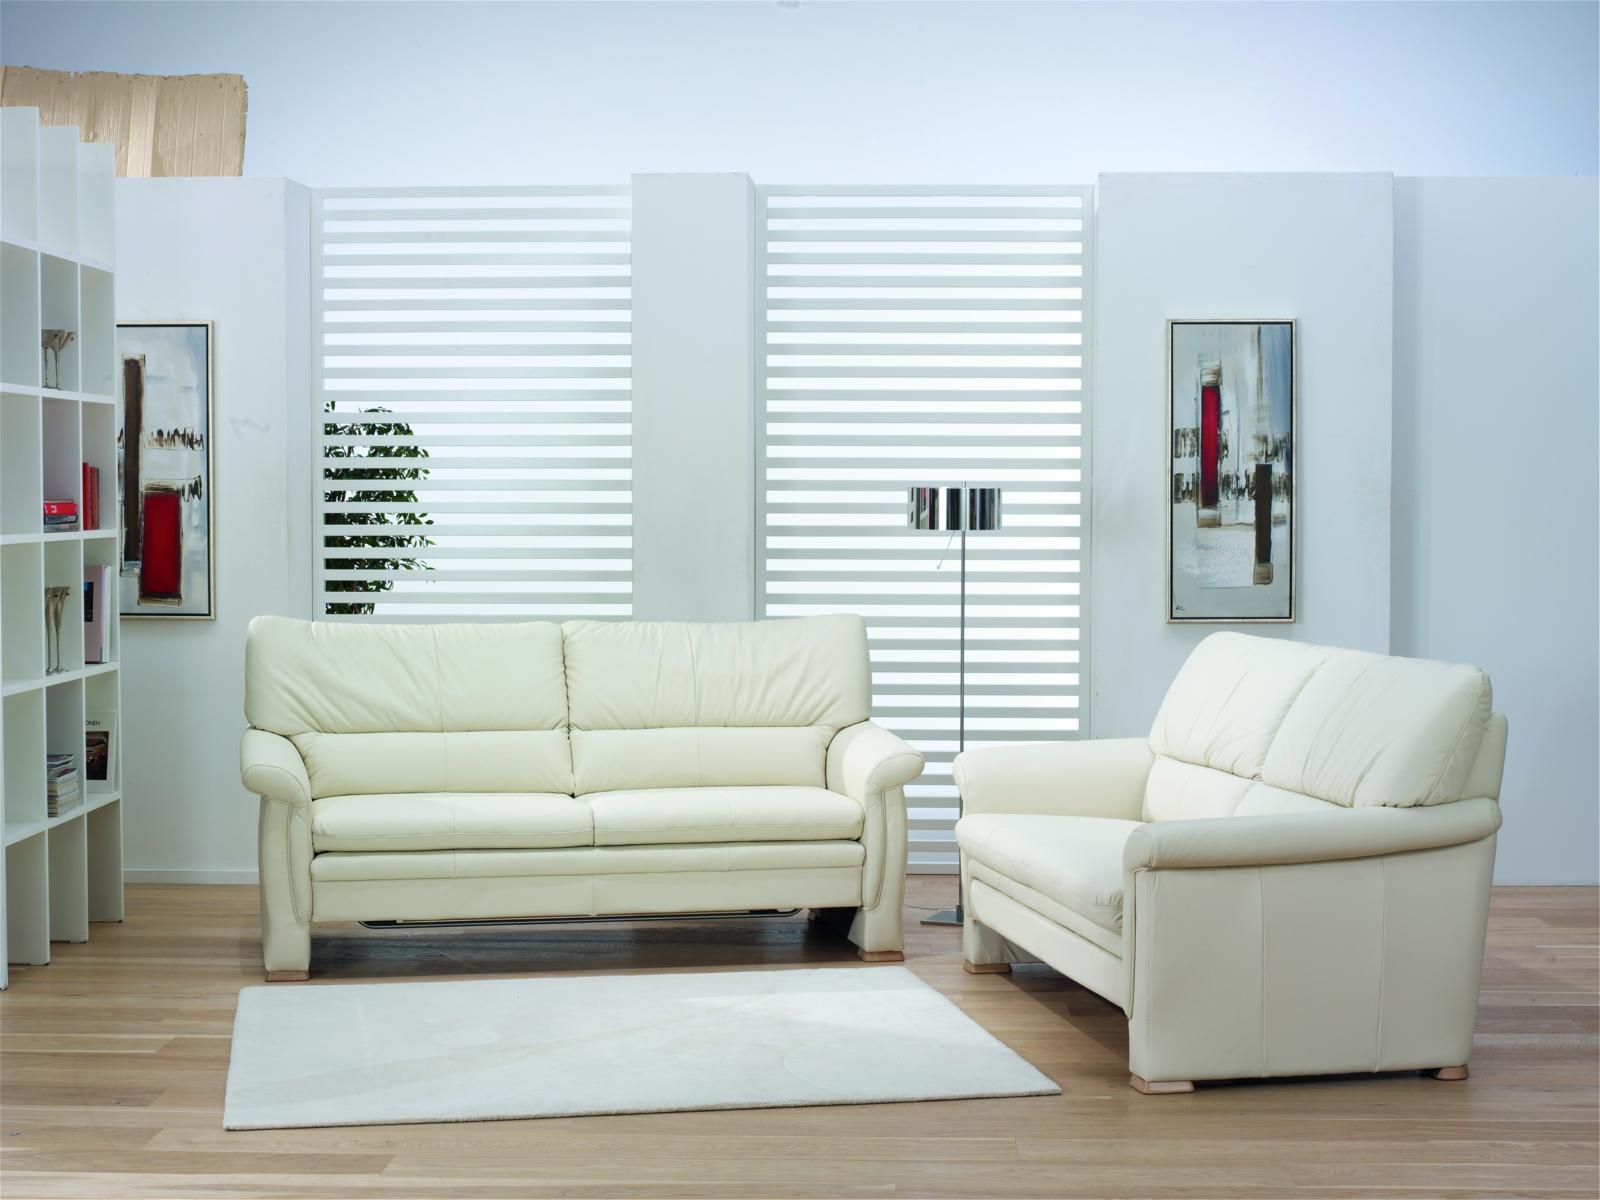 2 sitzer sofa mit doppelbett funktion von himolla top angebot ebay. Black Bedroom Furniture Sets. Home Design Ideas